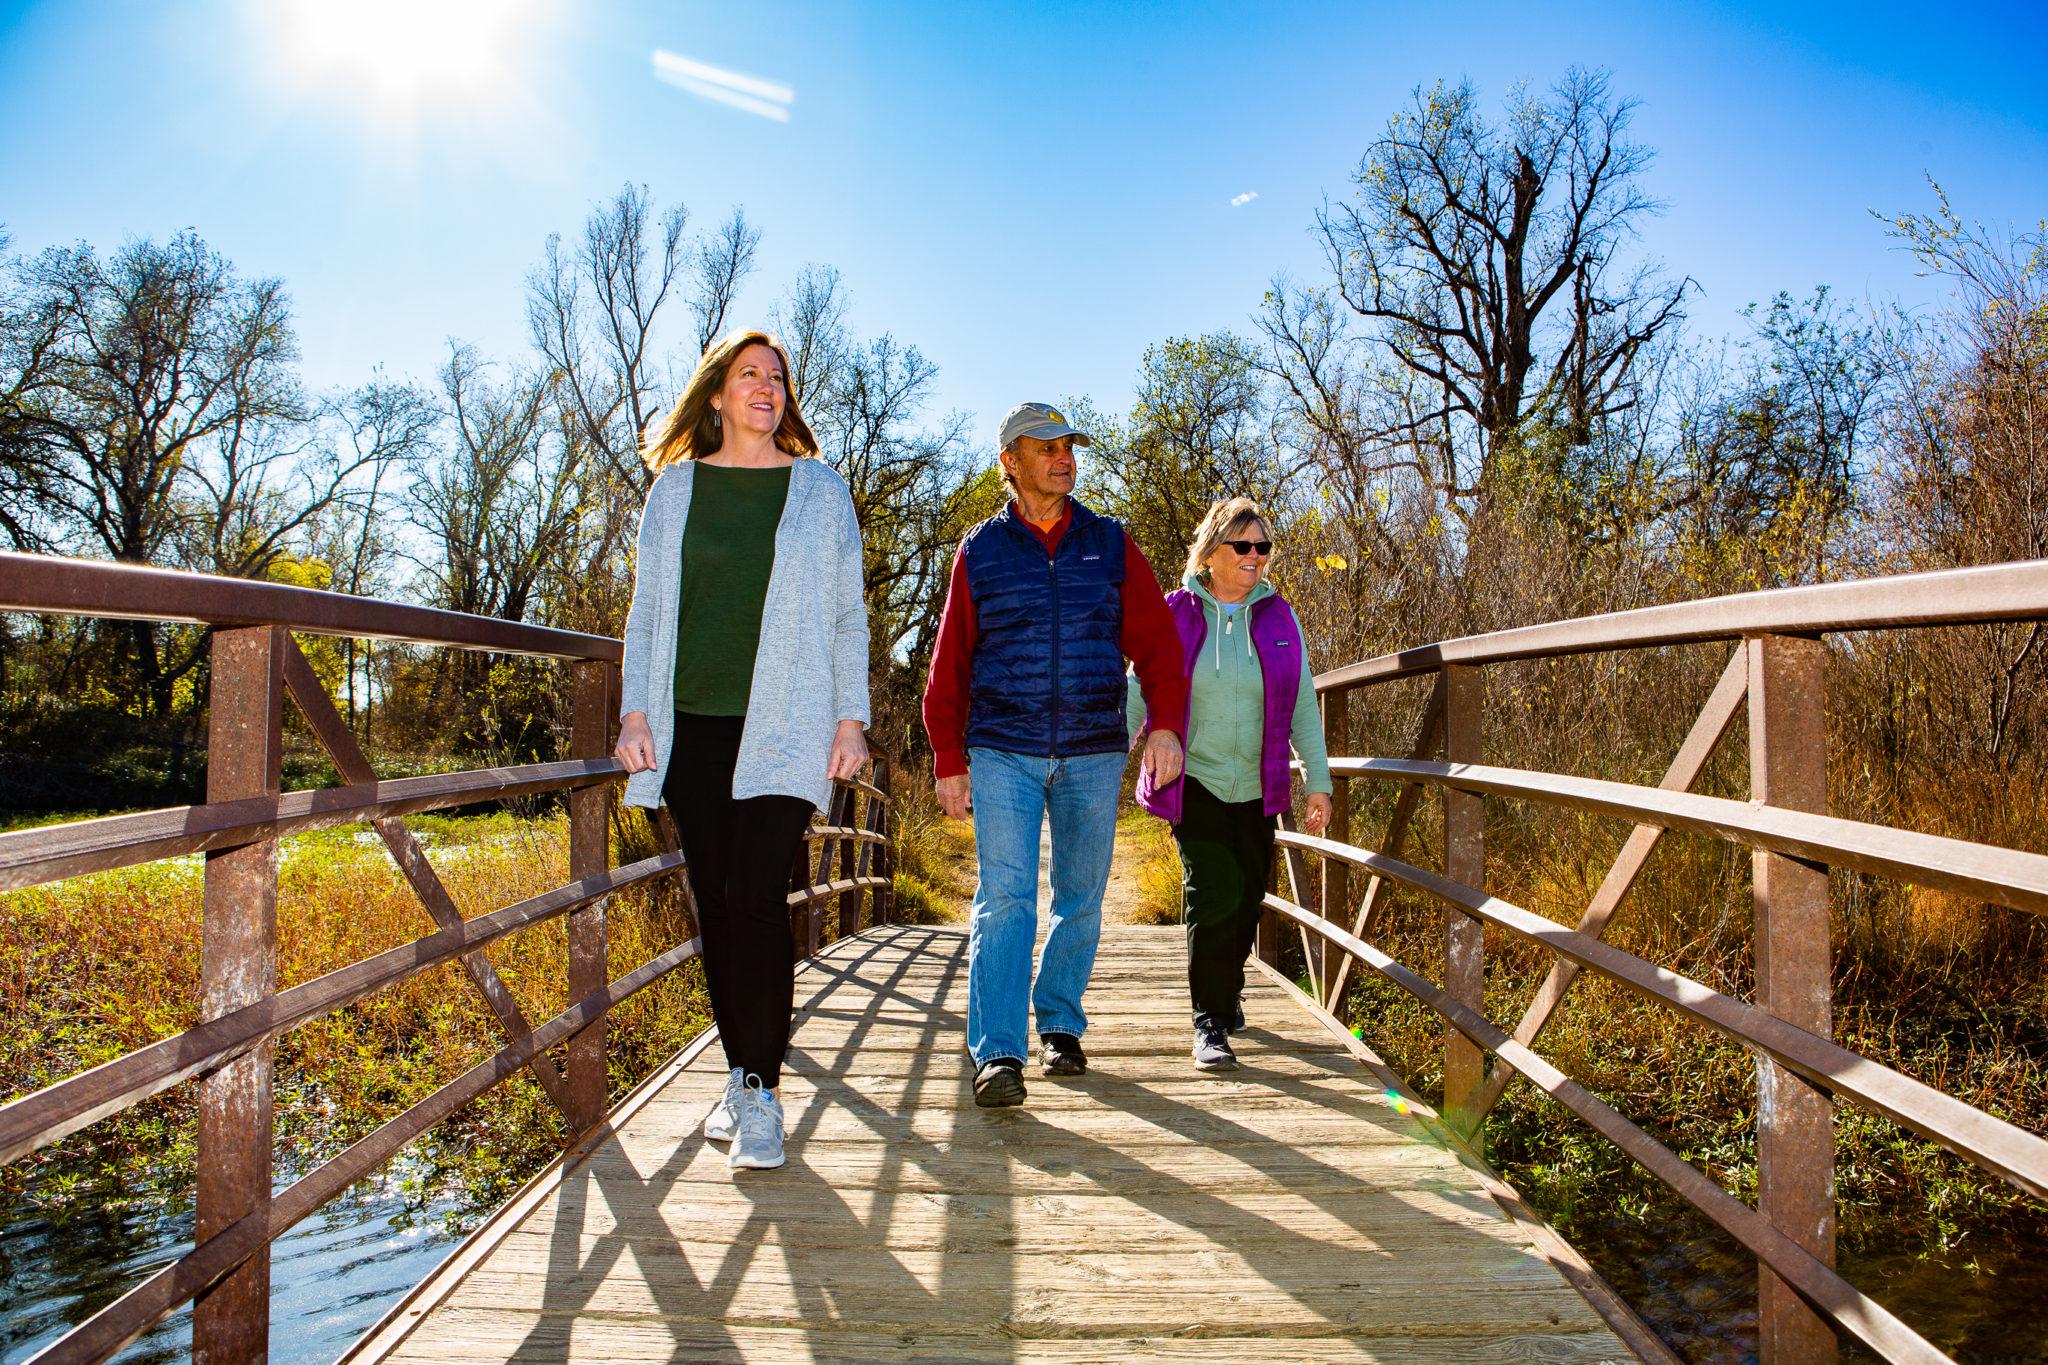 Group walking at Anderson River Park